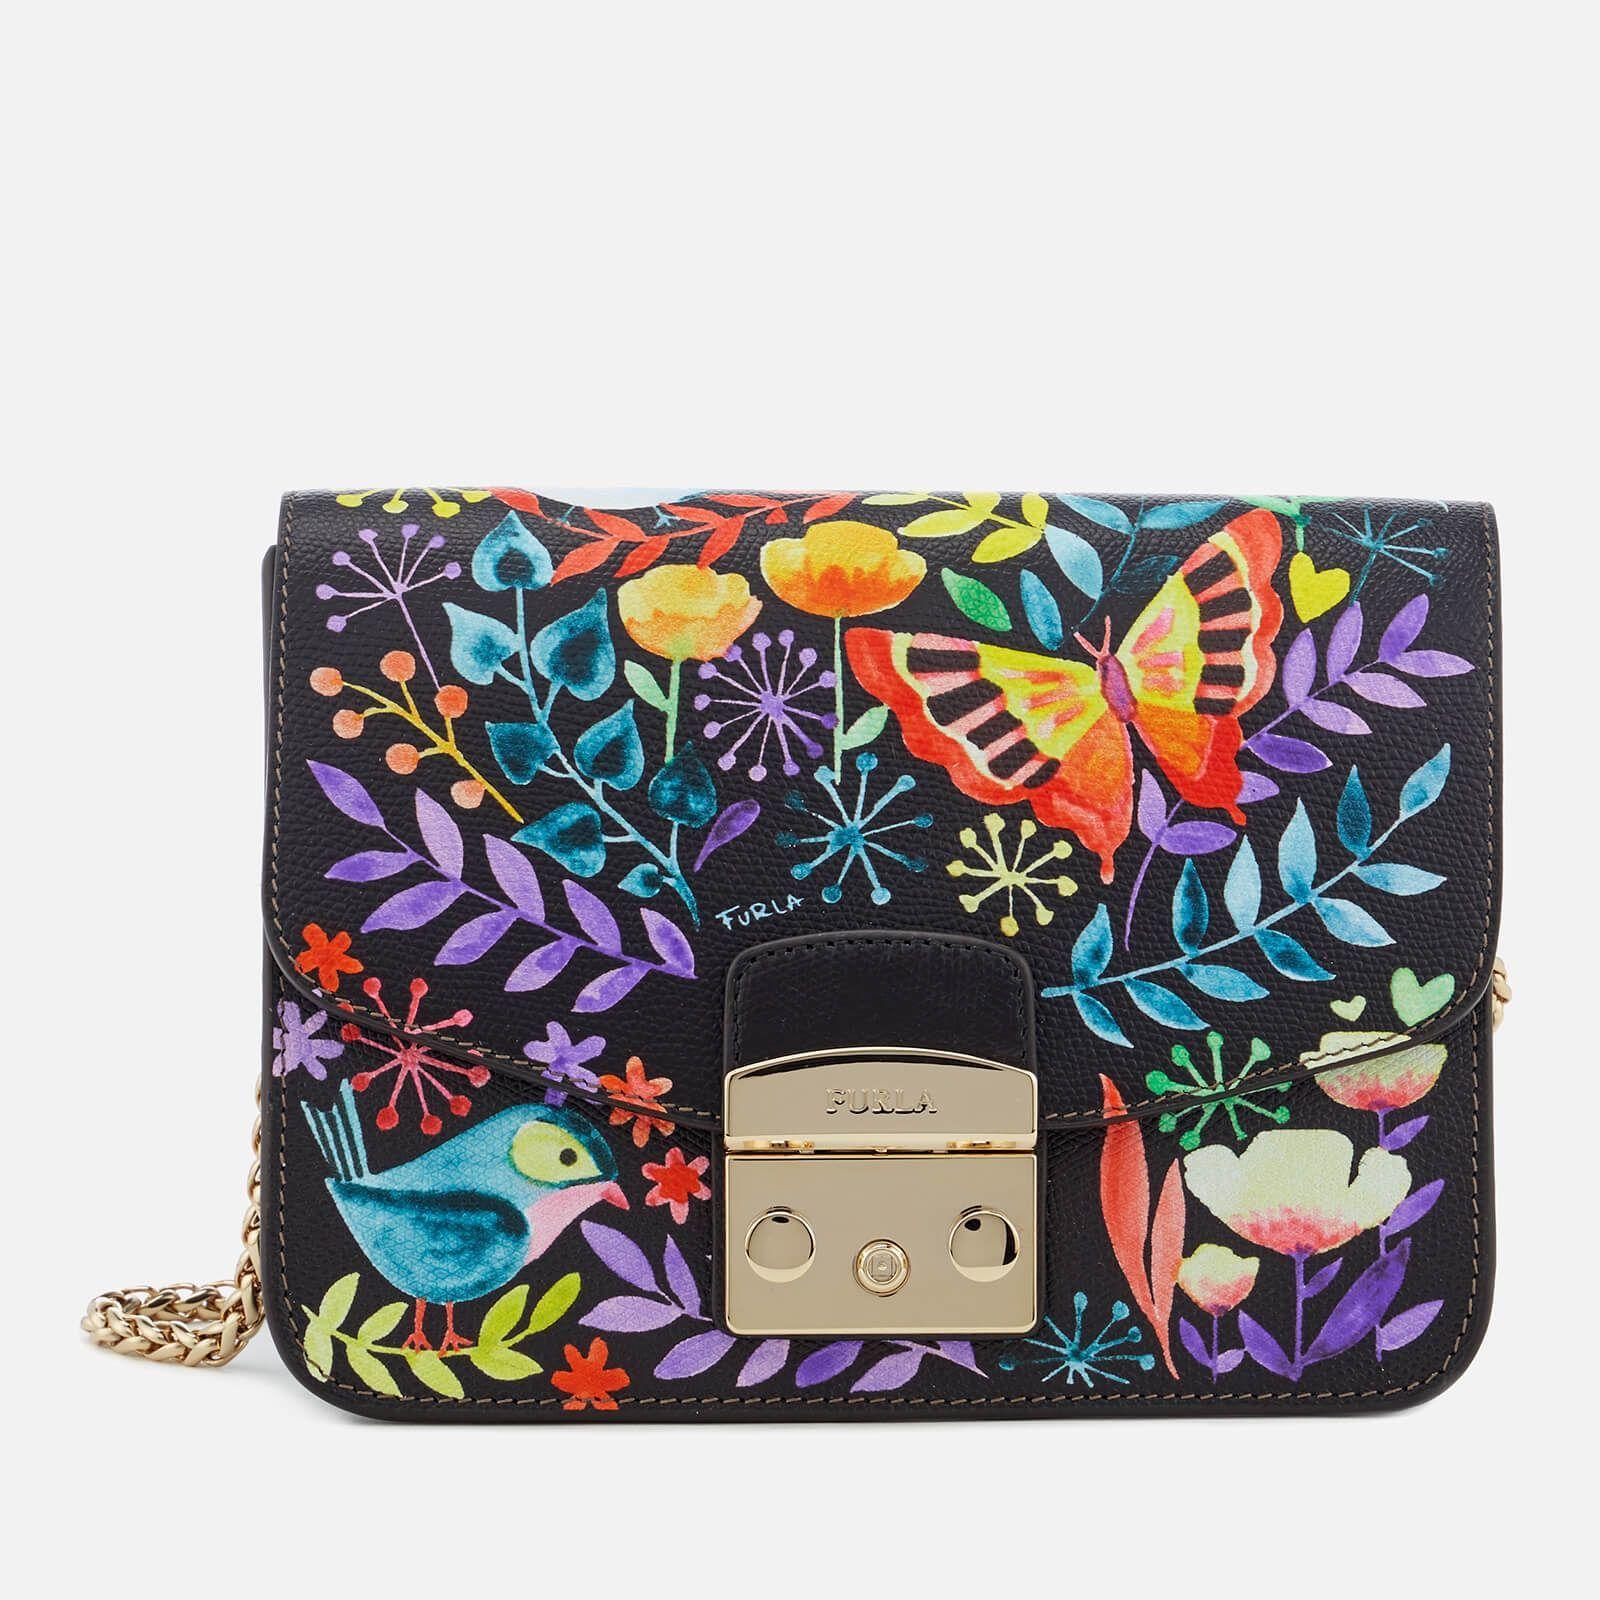 purchase Woman crossbody bag Furla Real mini black and